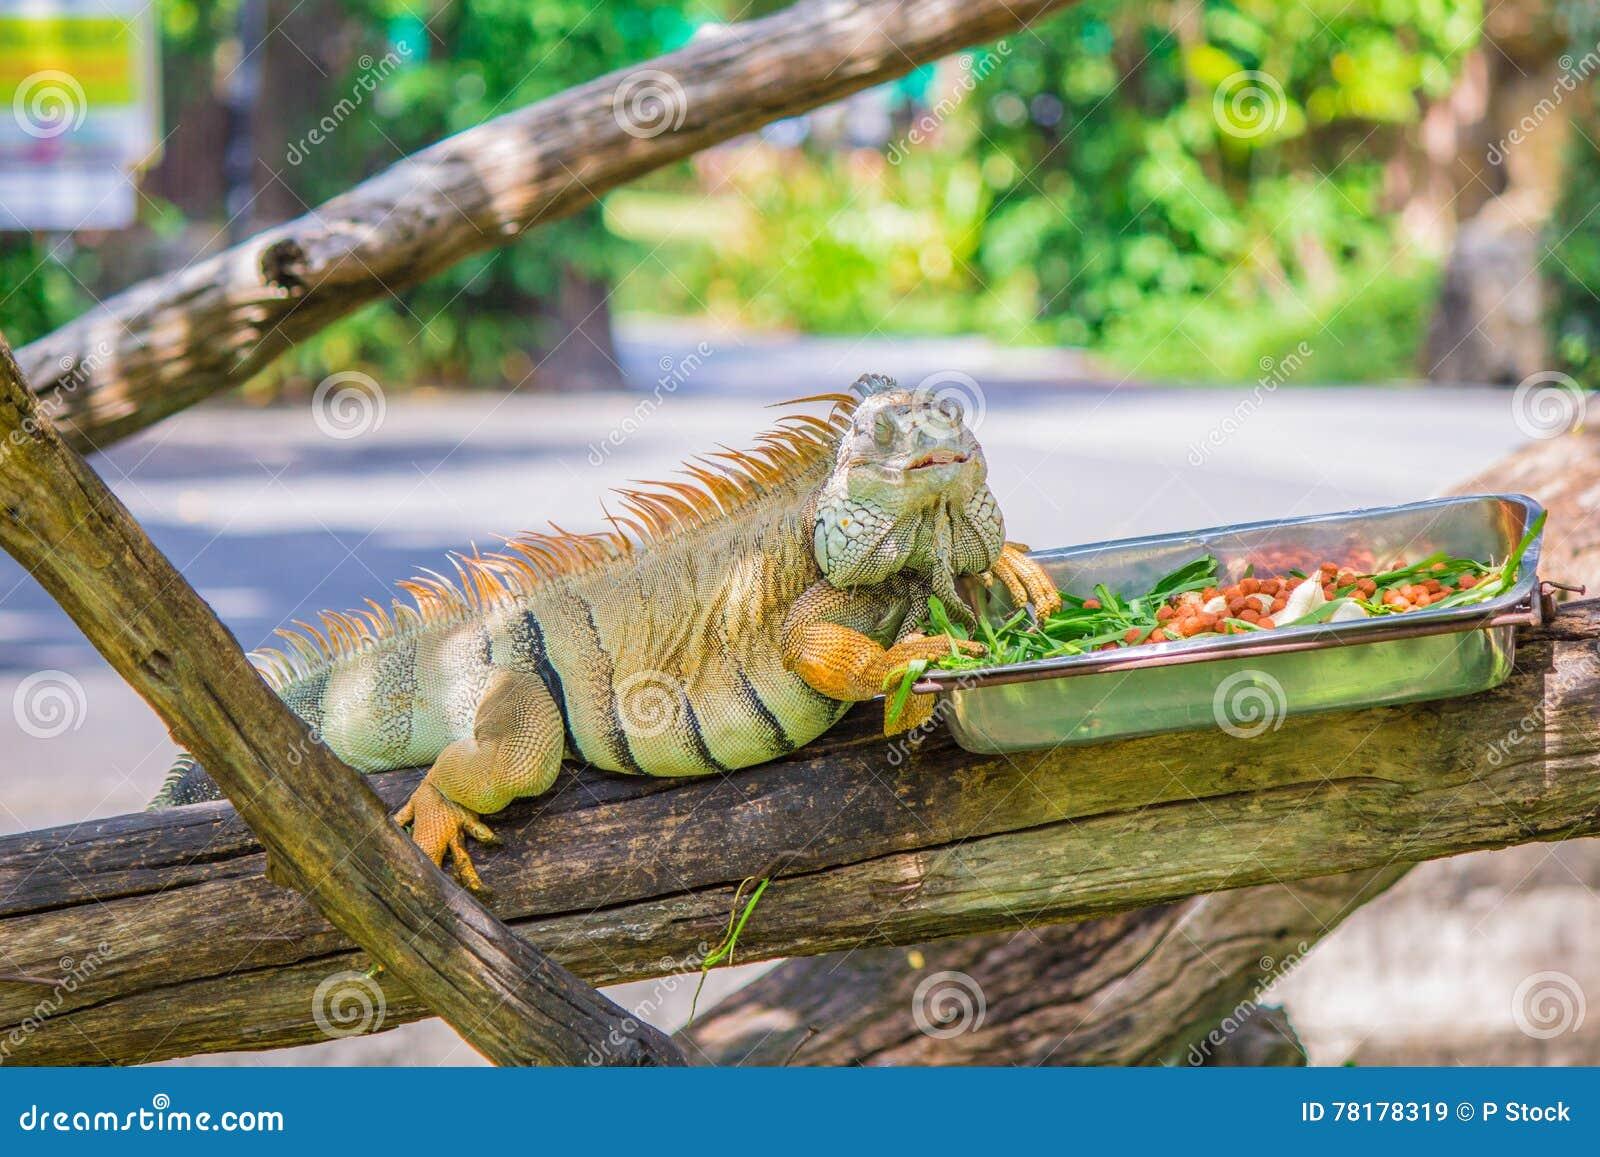 Chameleon and food.